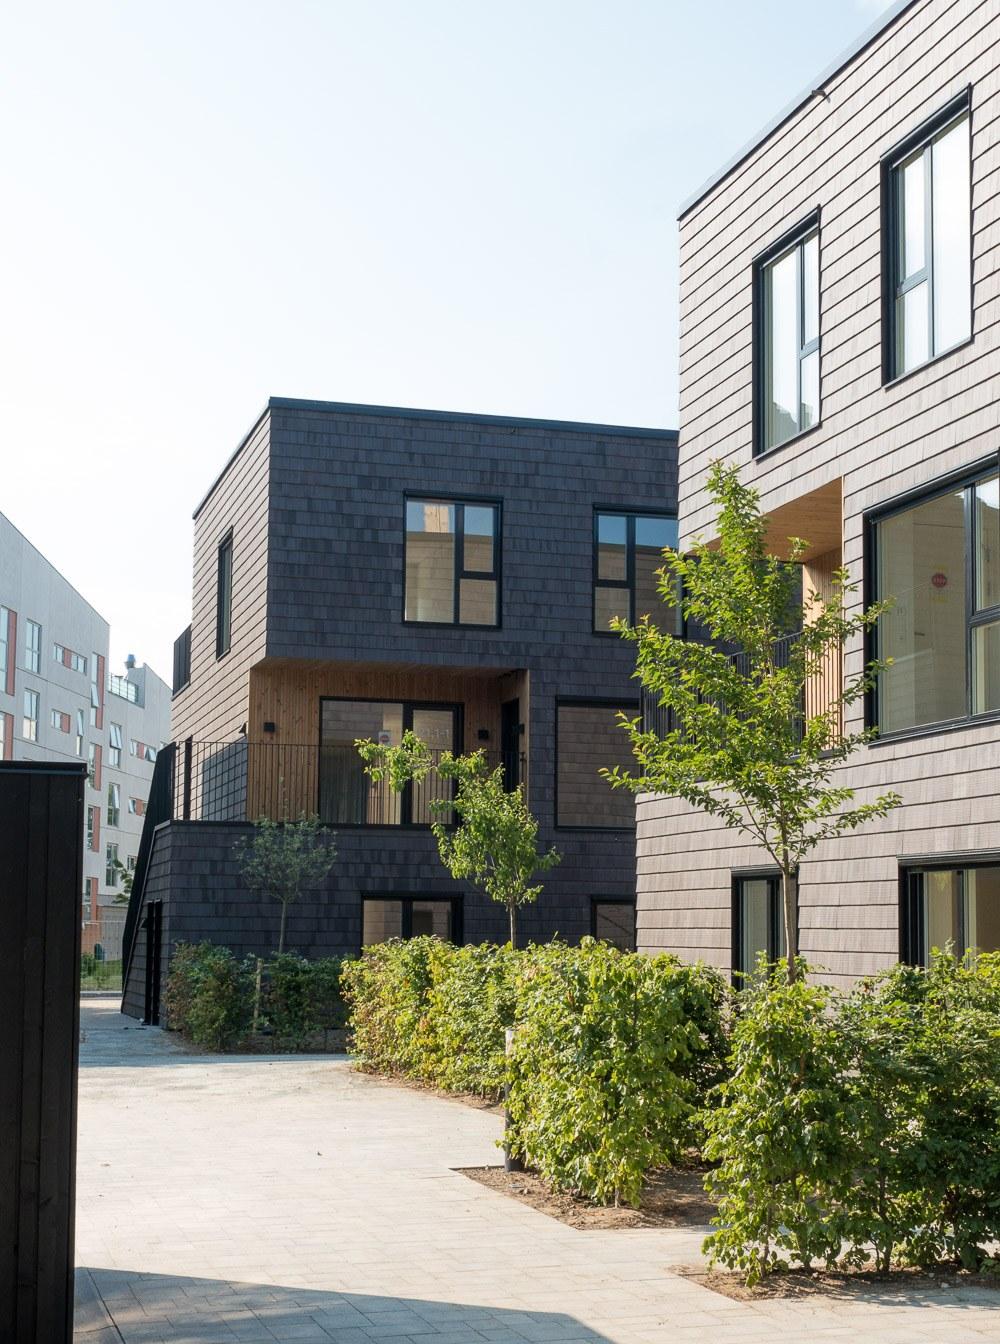 architect prefabricated housing general housing plus arkitekt ONV Ishøj arkitekter præfabrikeret bolig almen bolig plus koncept præfab bolig